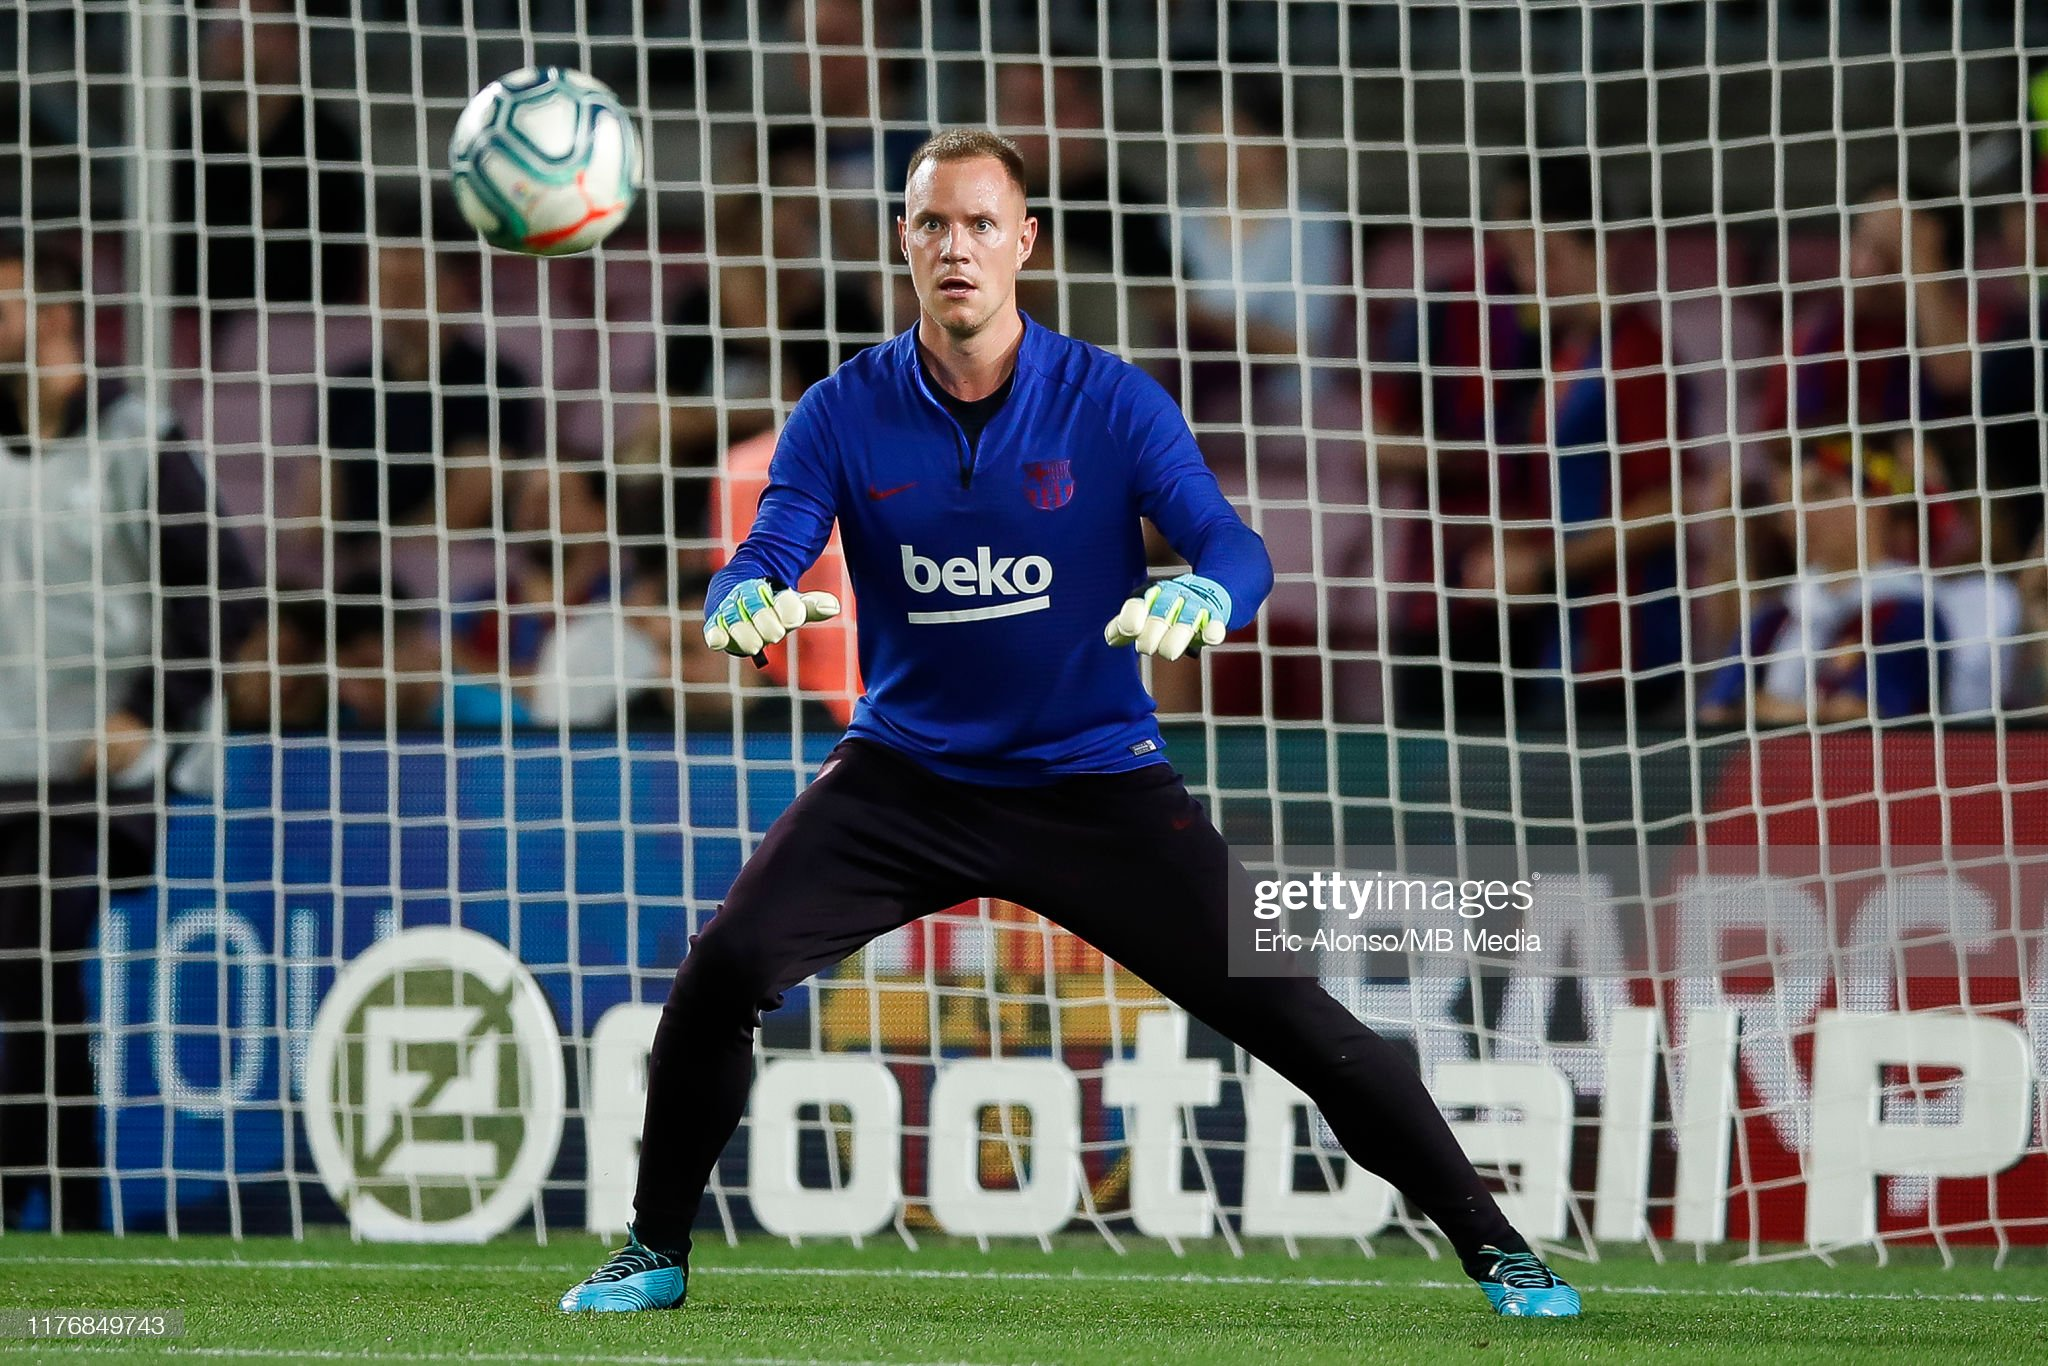 صور مباراة : برشلونة - فياريال 2-1 ( 24-09-2019 )  Marc-andre-ter-stegen-during-the-warm-up-of-liga-match-between-fc-picture-id1176849743?s=2048x2048